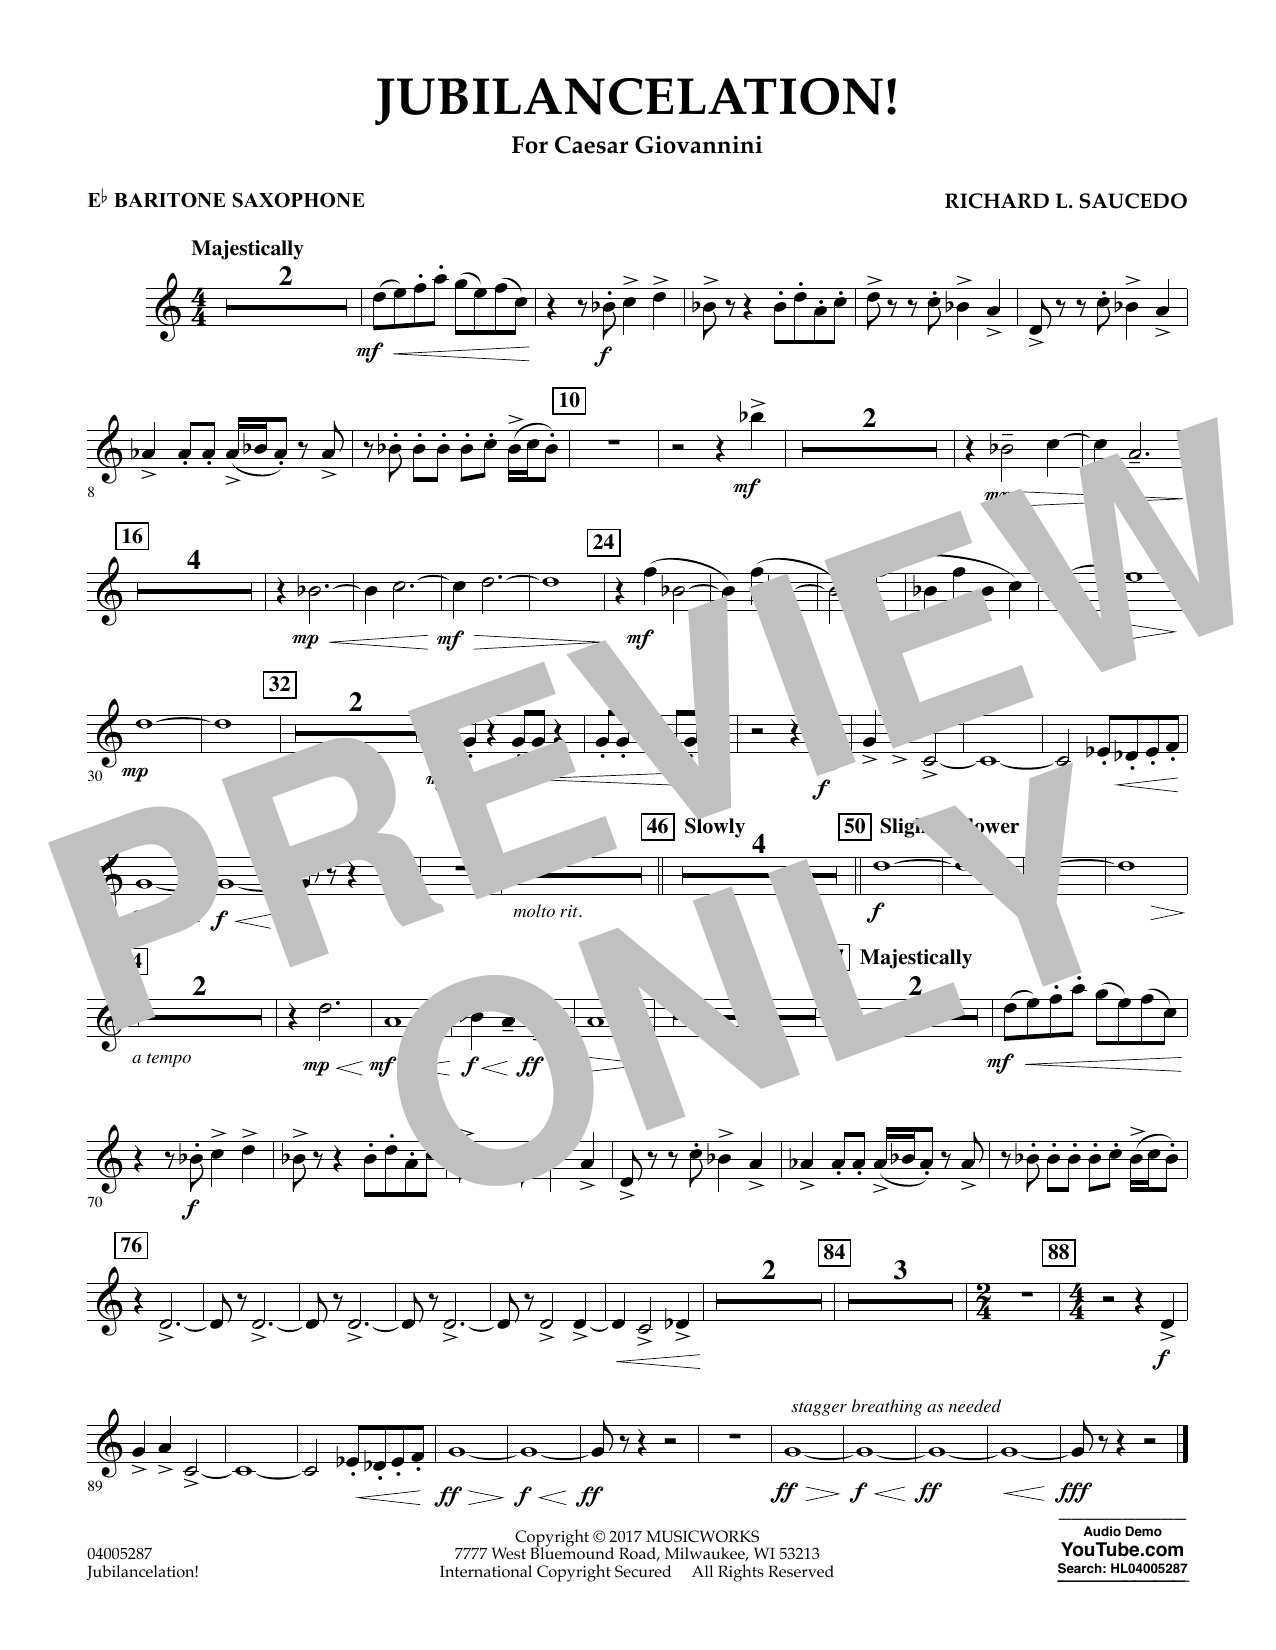 Jubilancelation! - Eb Baritone Saxophone (Concert Band)